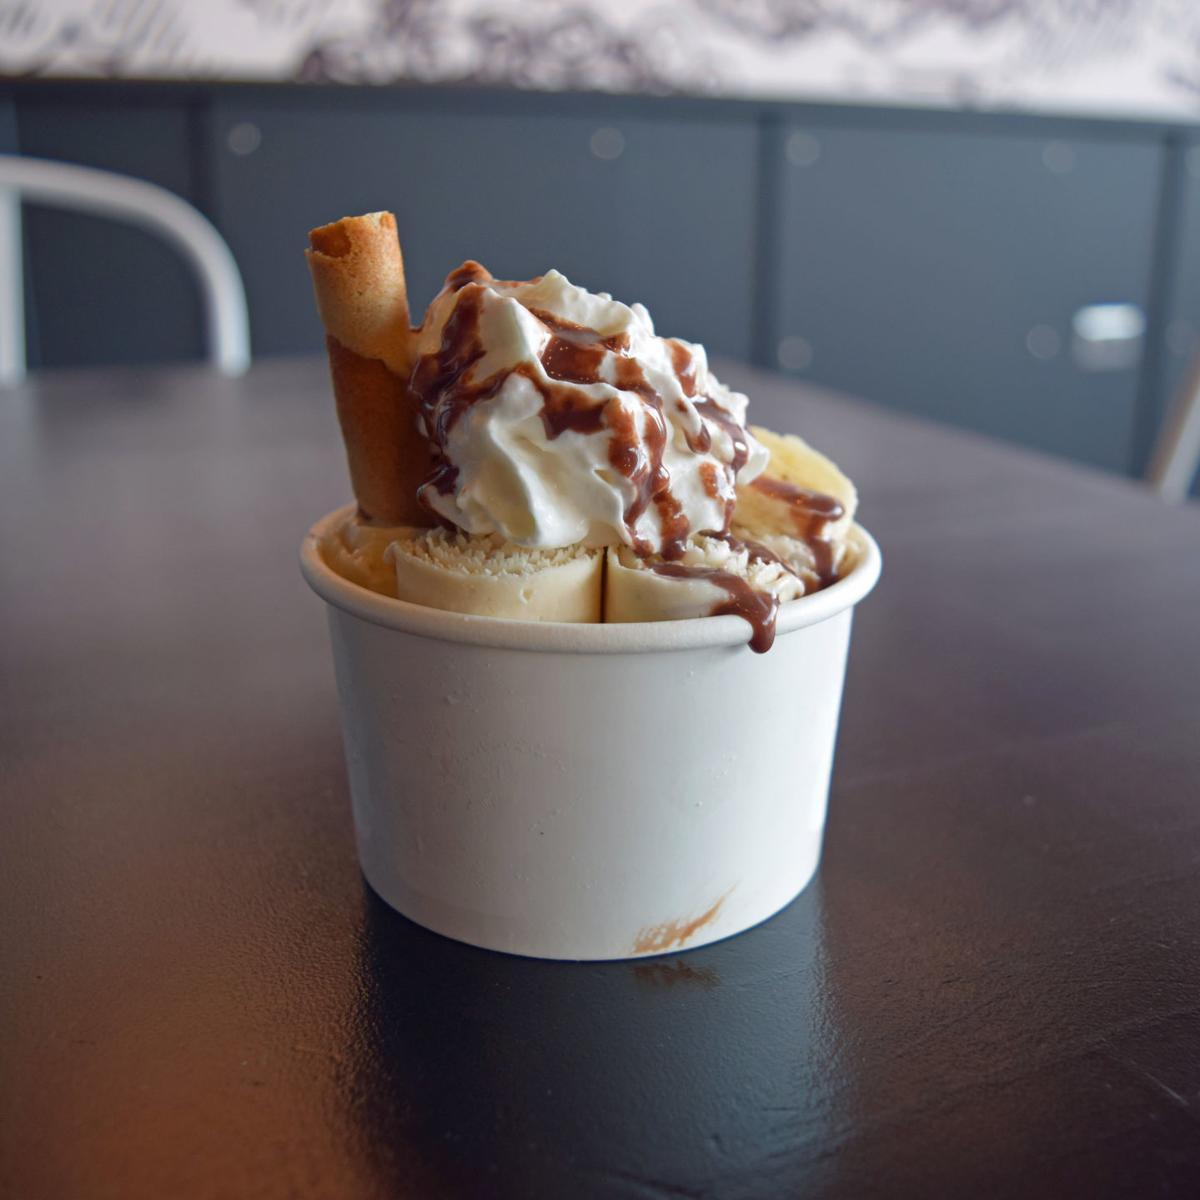 Rolled ice cream 1